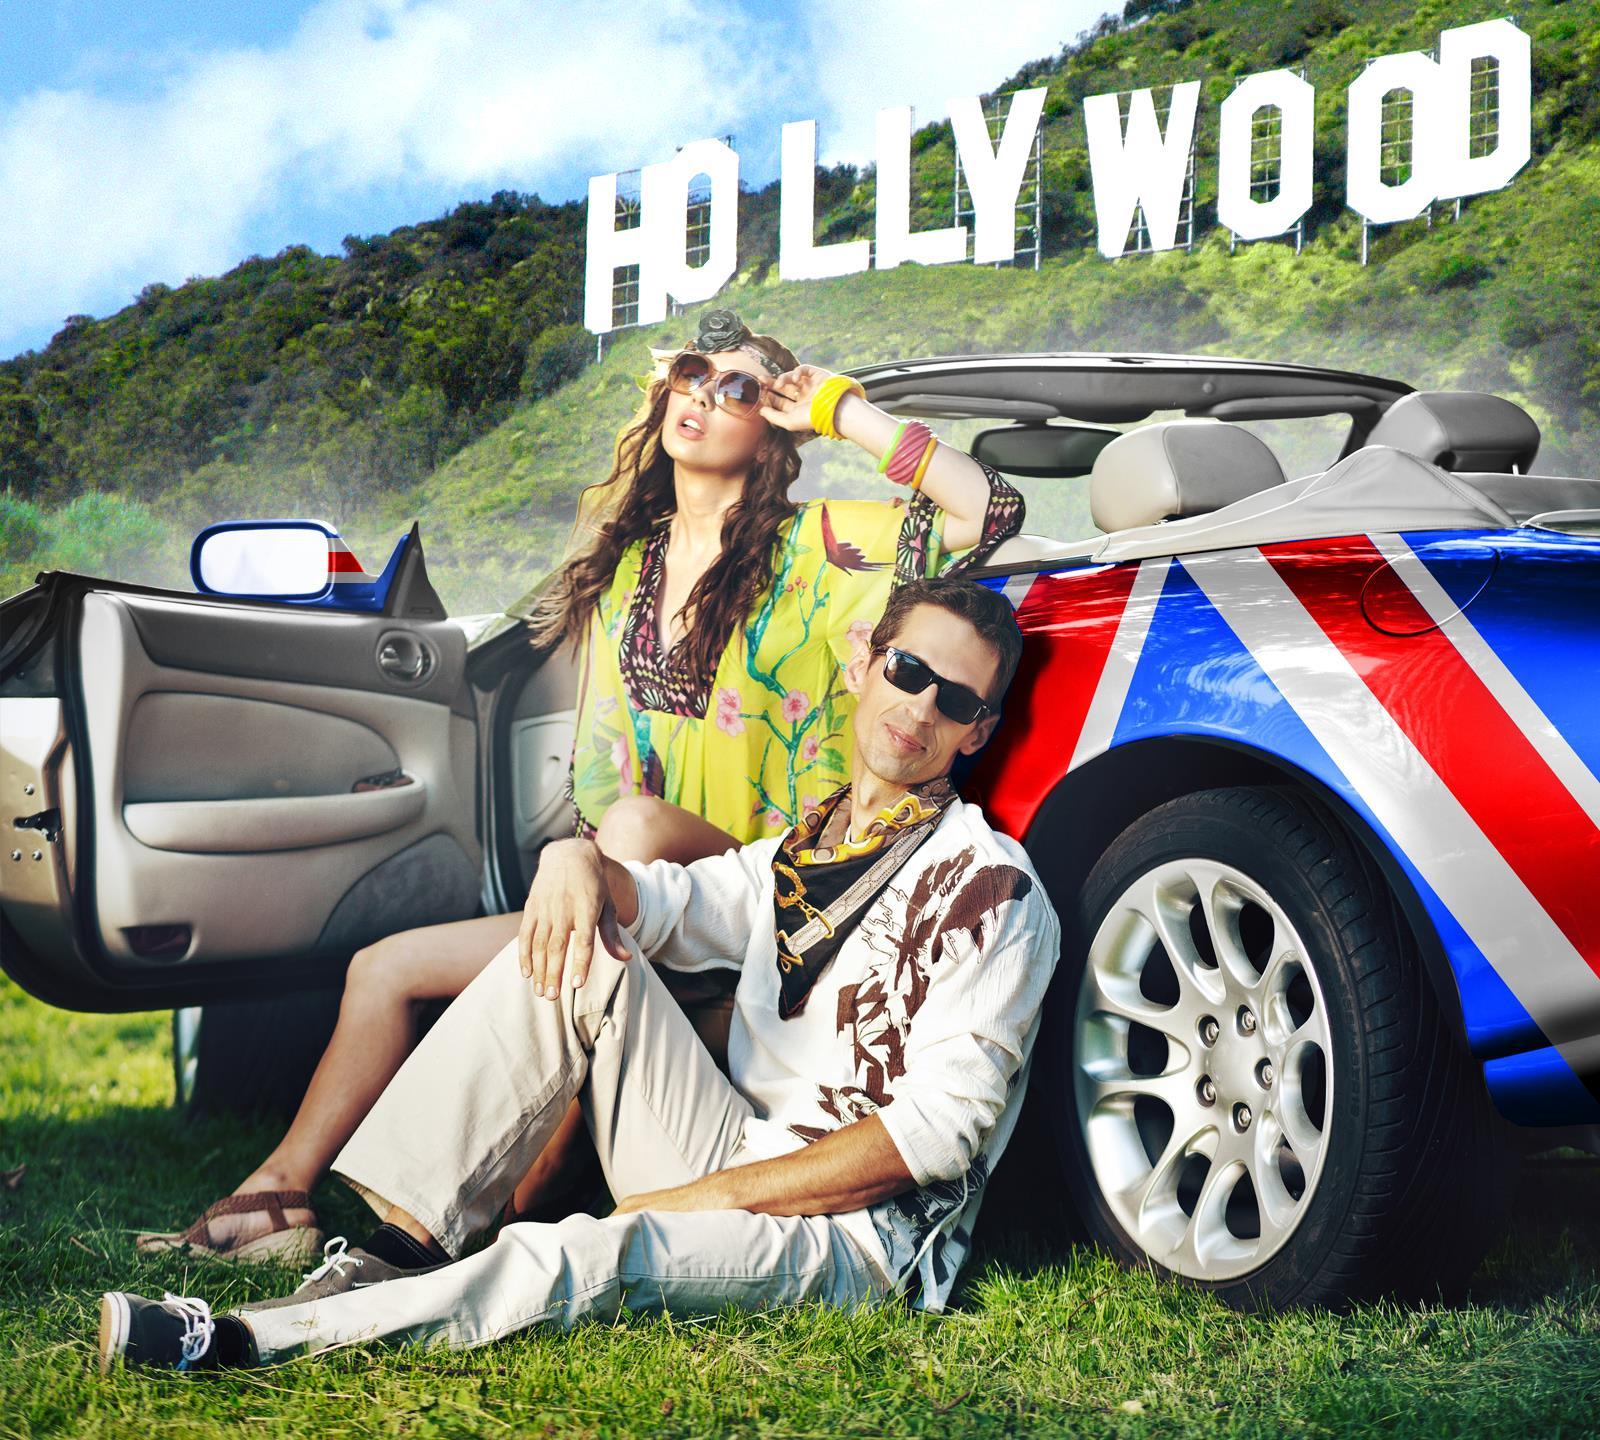 Hollywood Speed Dating Przewodnik GQ po randkach internetowych